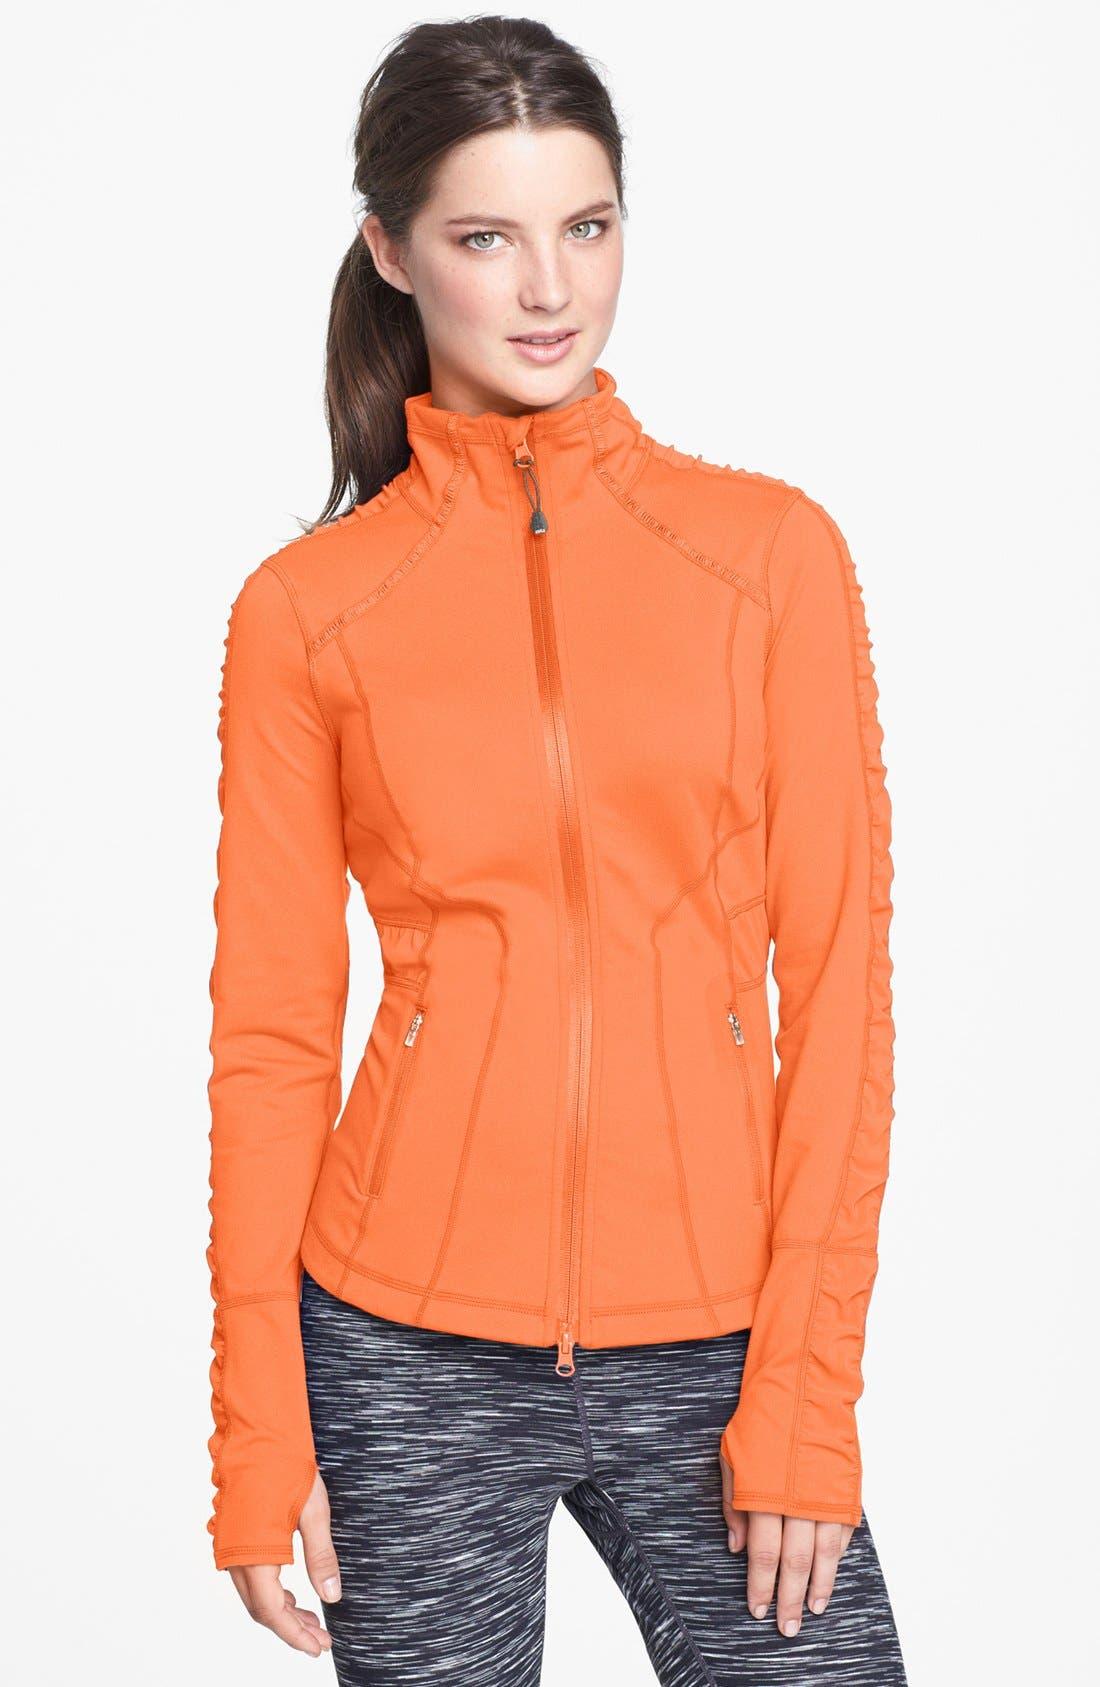 Main Image - Zella 'Prism' Jacket